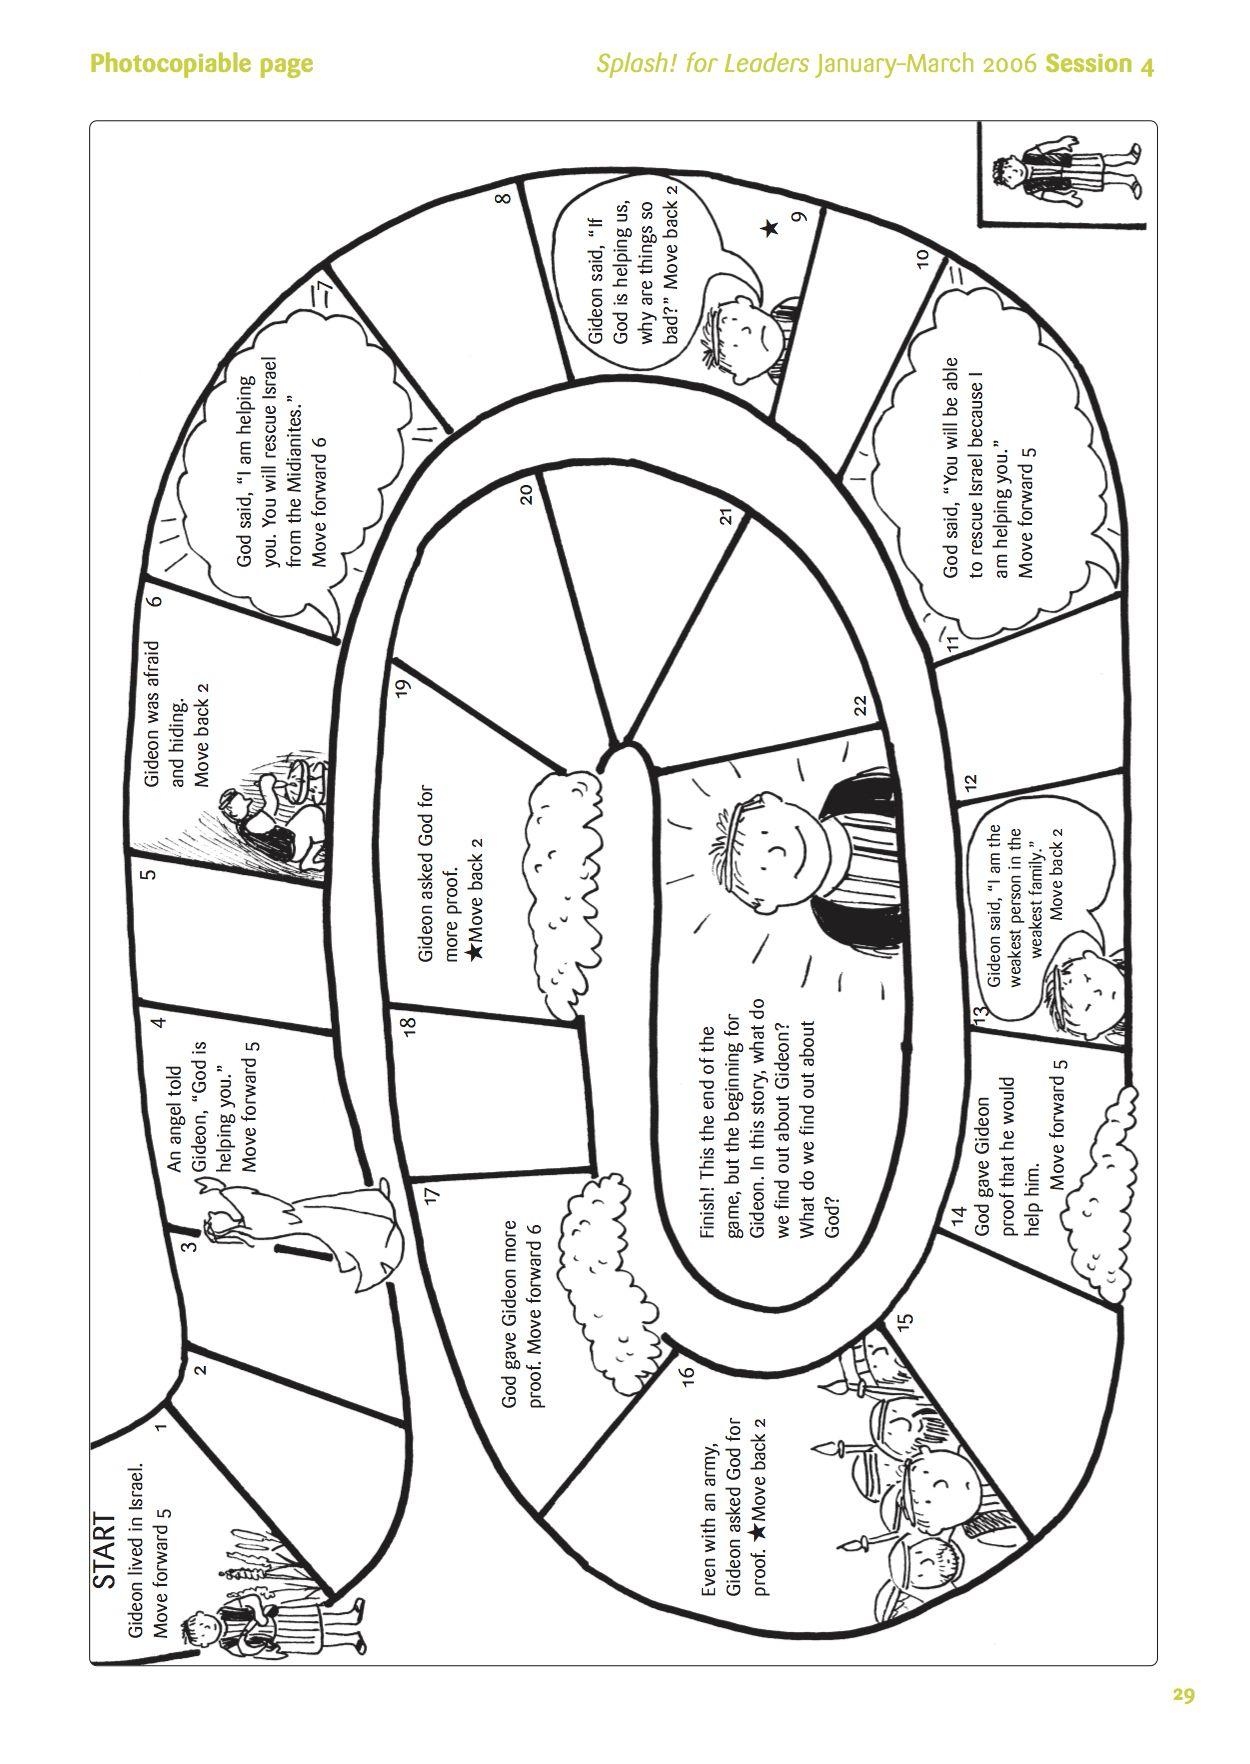 gideon board game full focus 2015 pinterest board gaming and sunday school. Black Bedroom Furniture Sets. Home Design Ideas